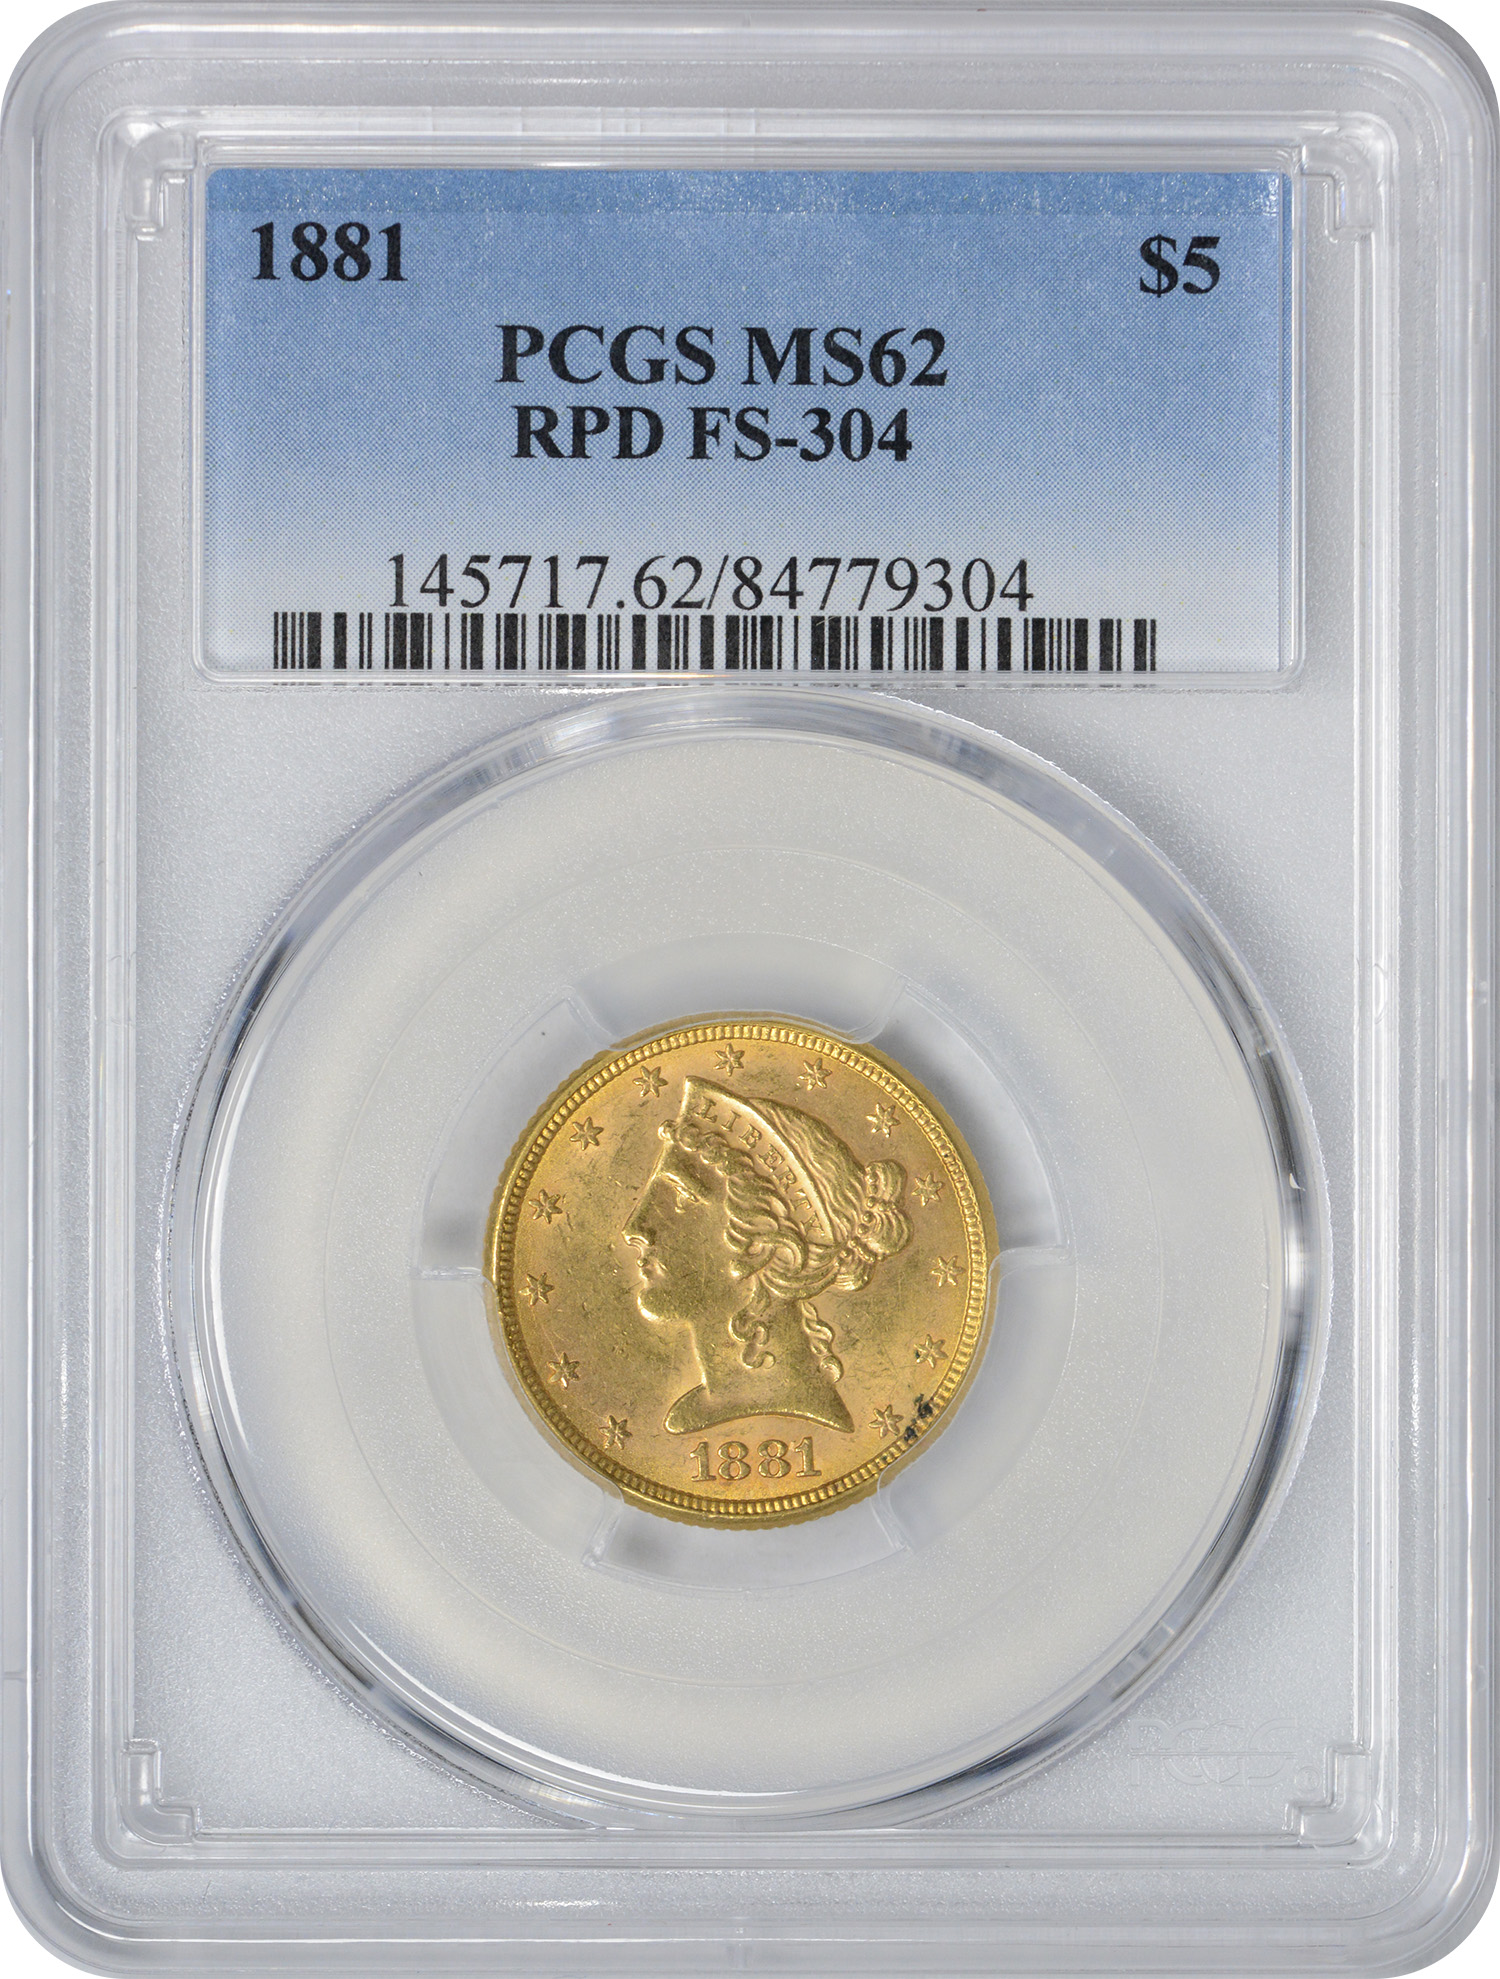 1881 $5 Gold Liberty RPD FS-304 MS62 PCGS